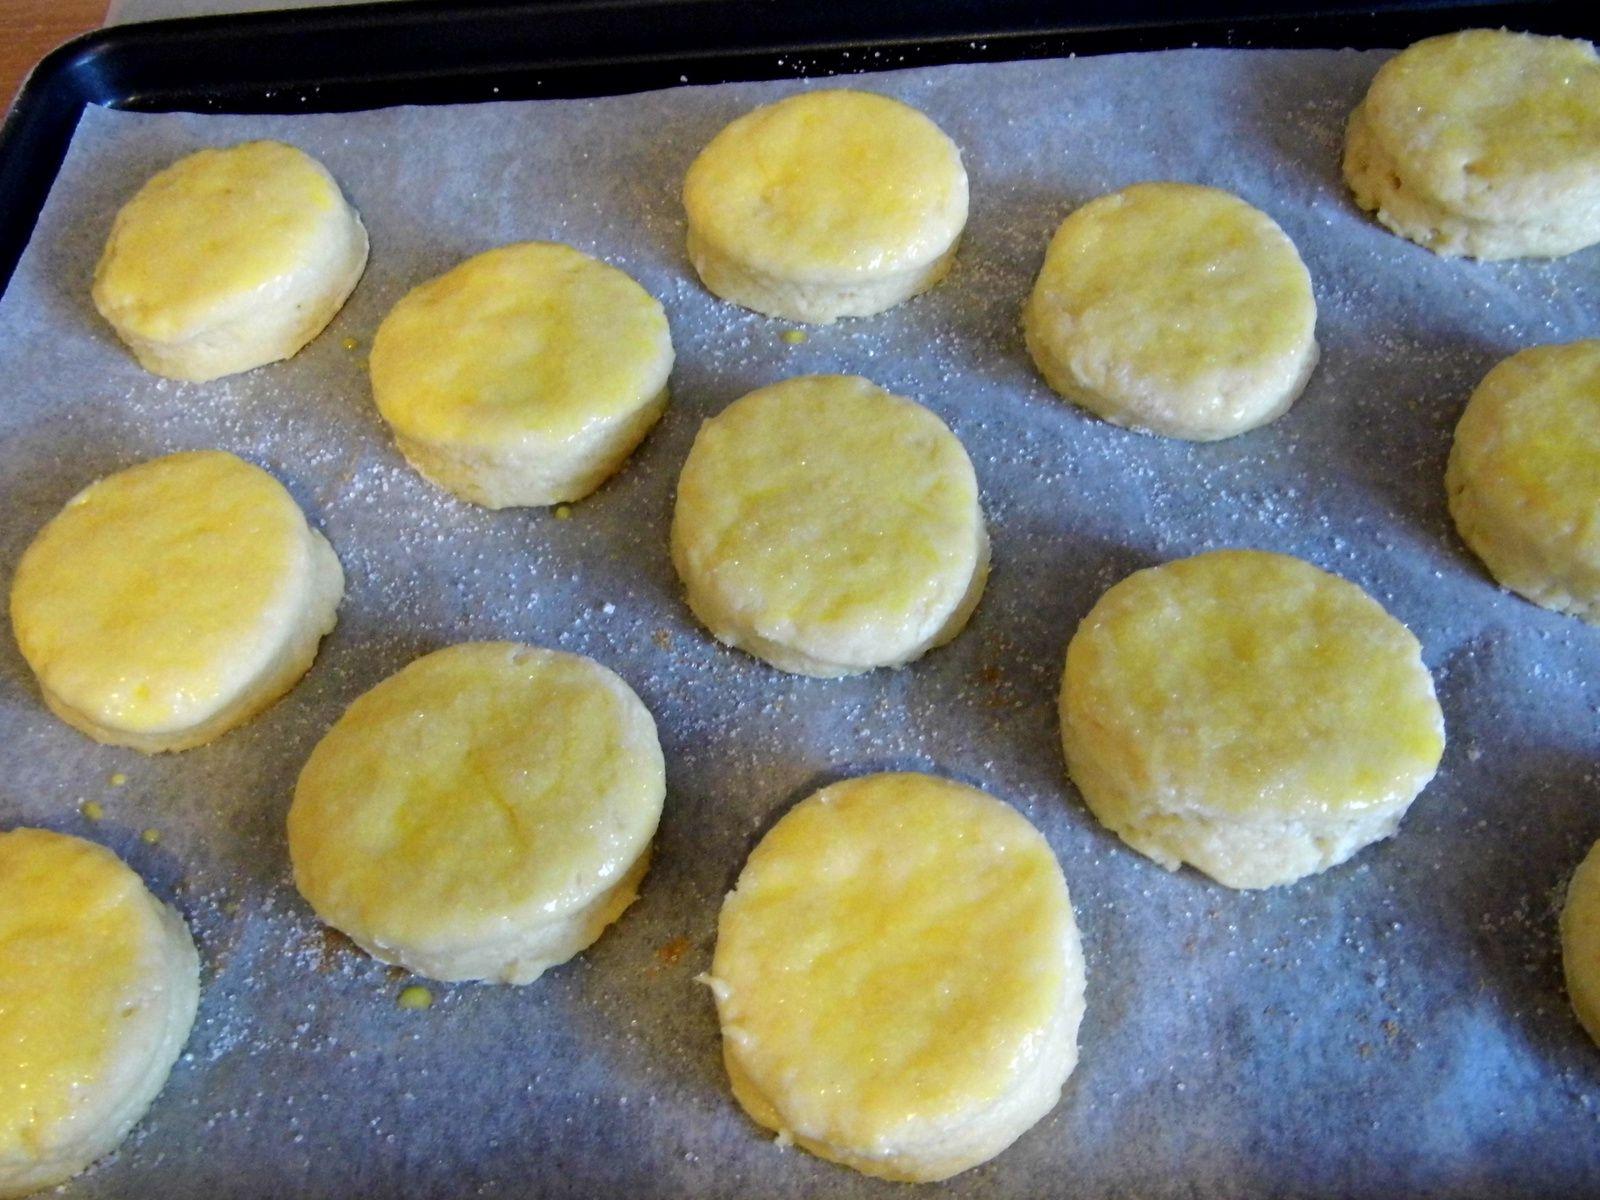 Les scones avant la cuisson